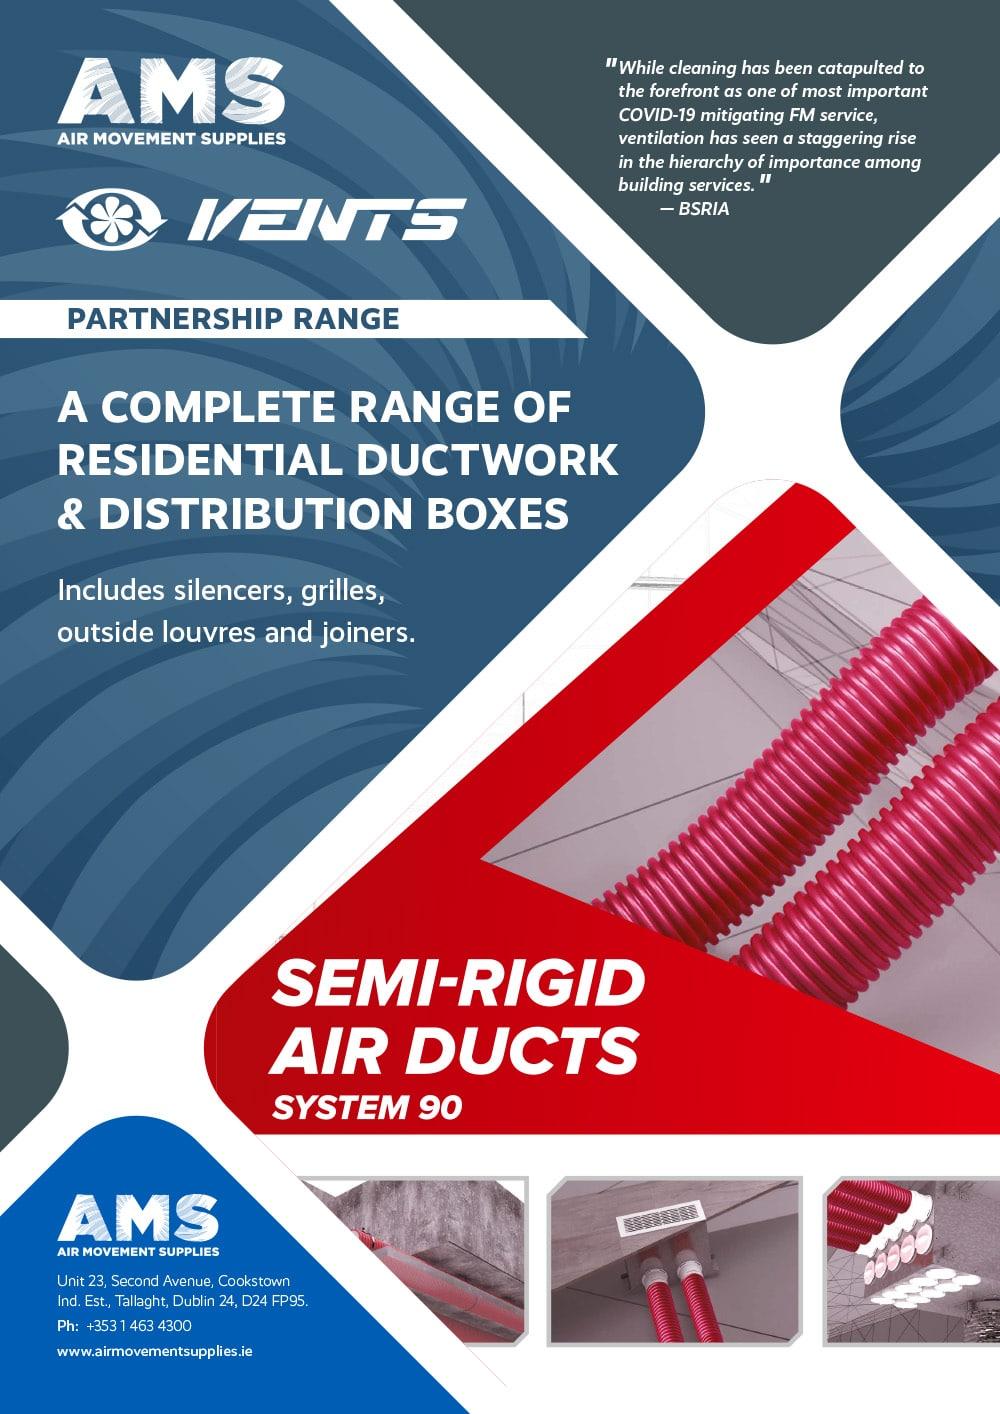 AMS Vents Partnership Range Ductwork Distribution